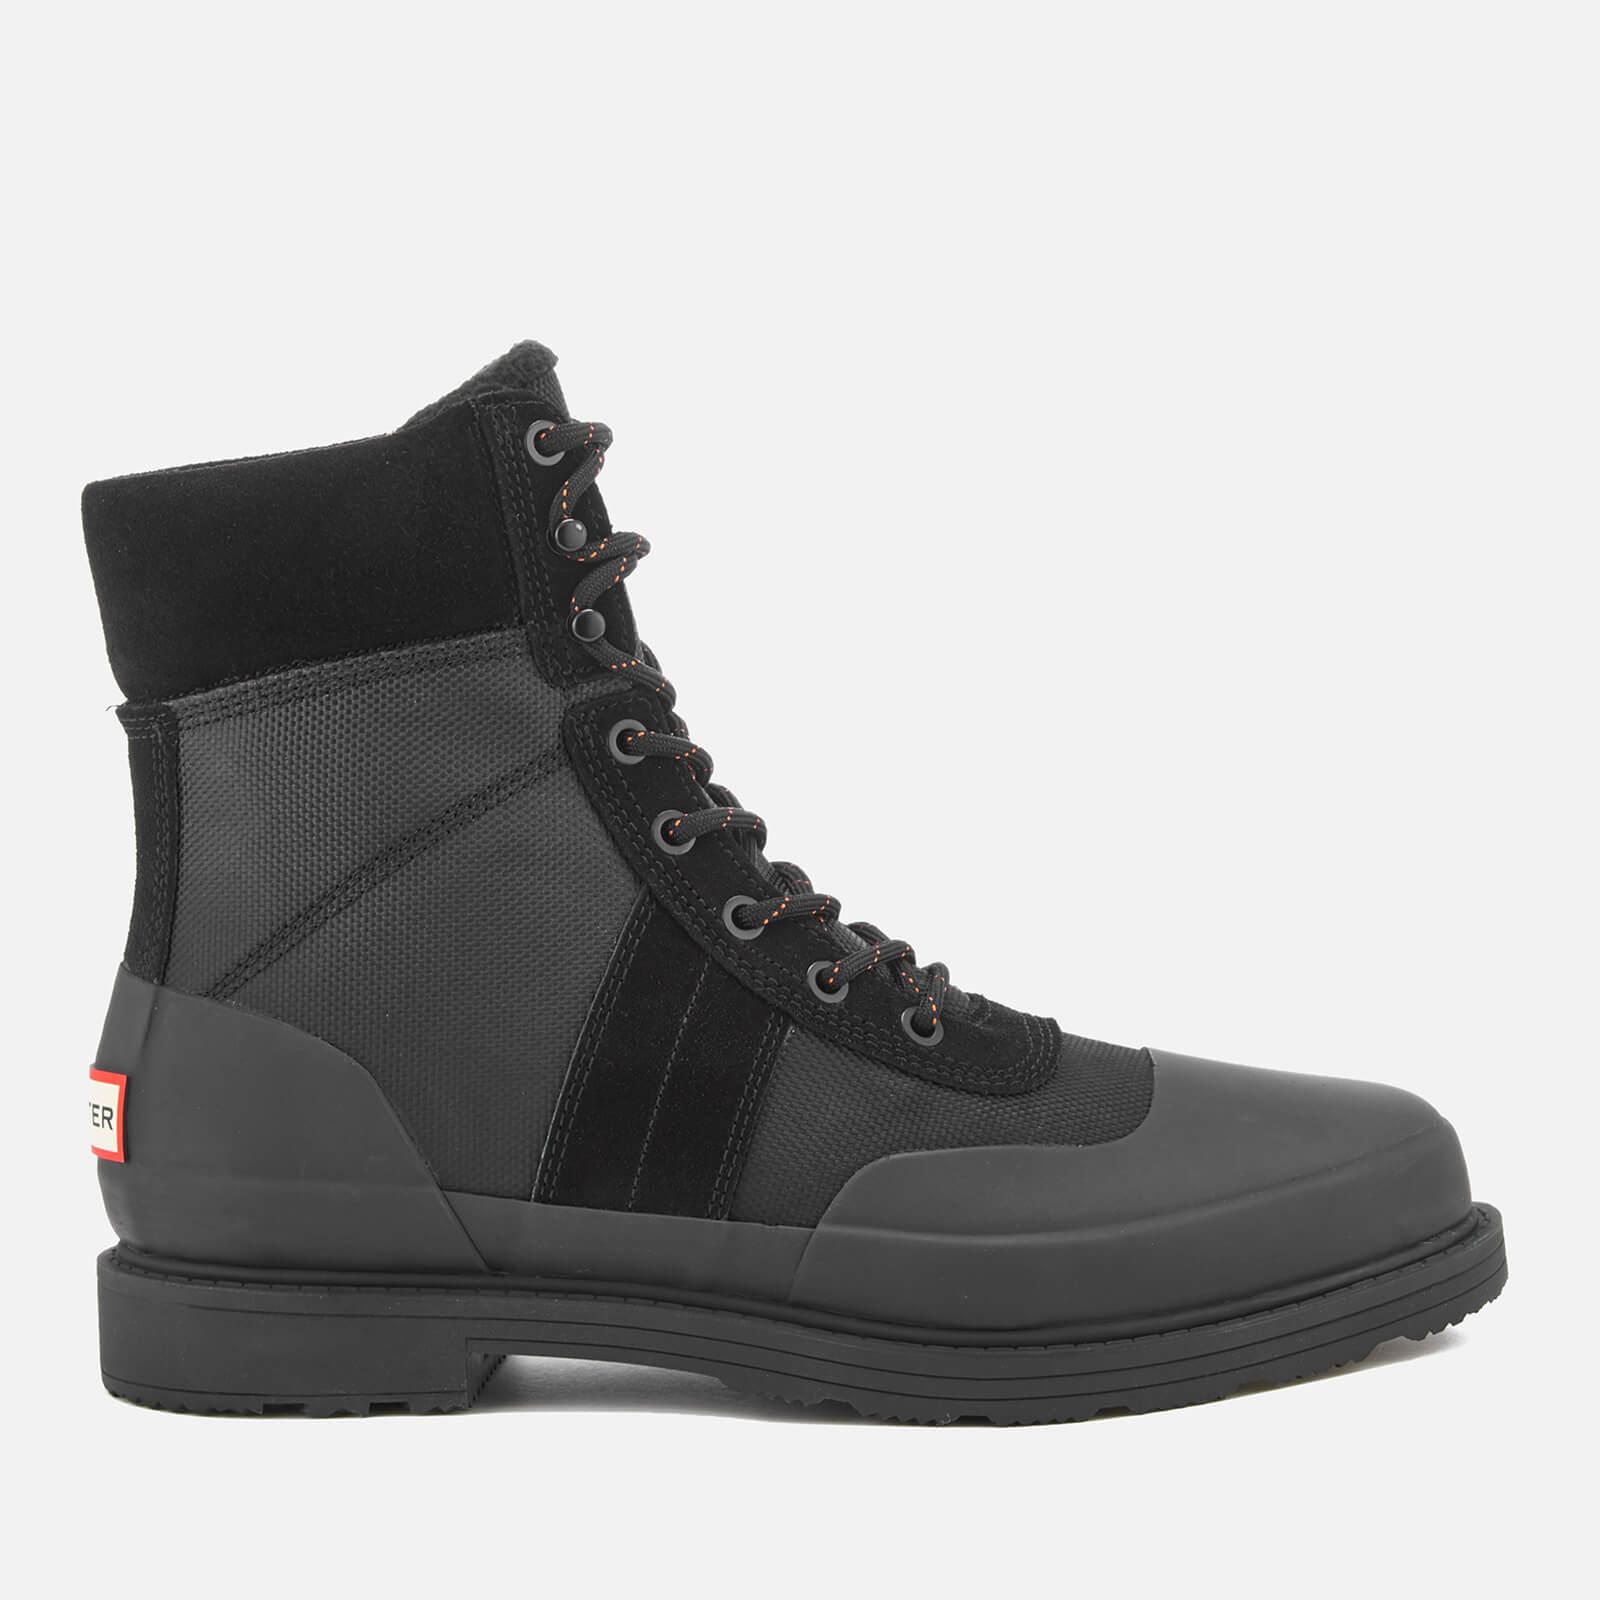 8fc20086224 Hunter Men's Original Insulated Commando Boots - Black